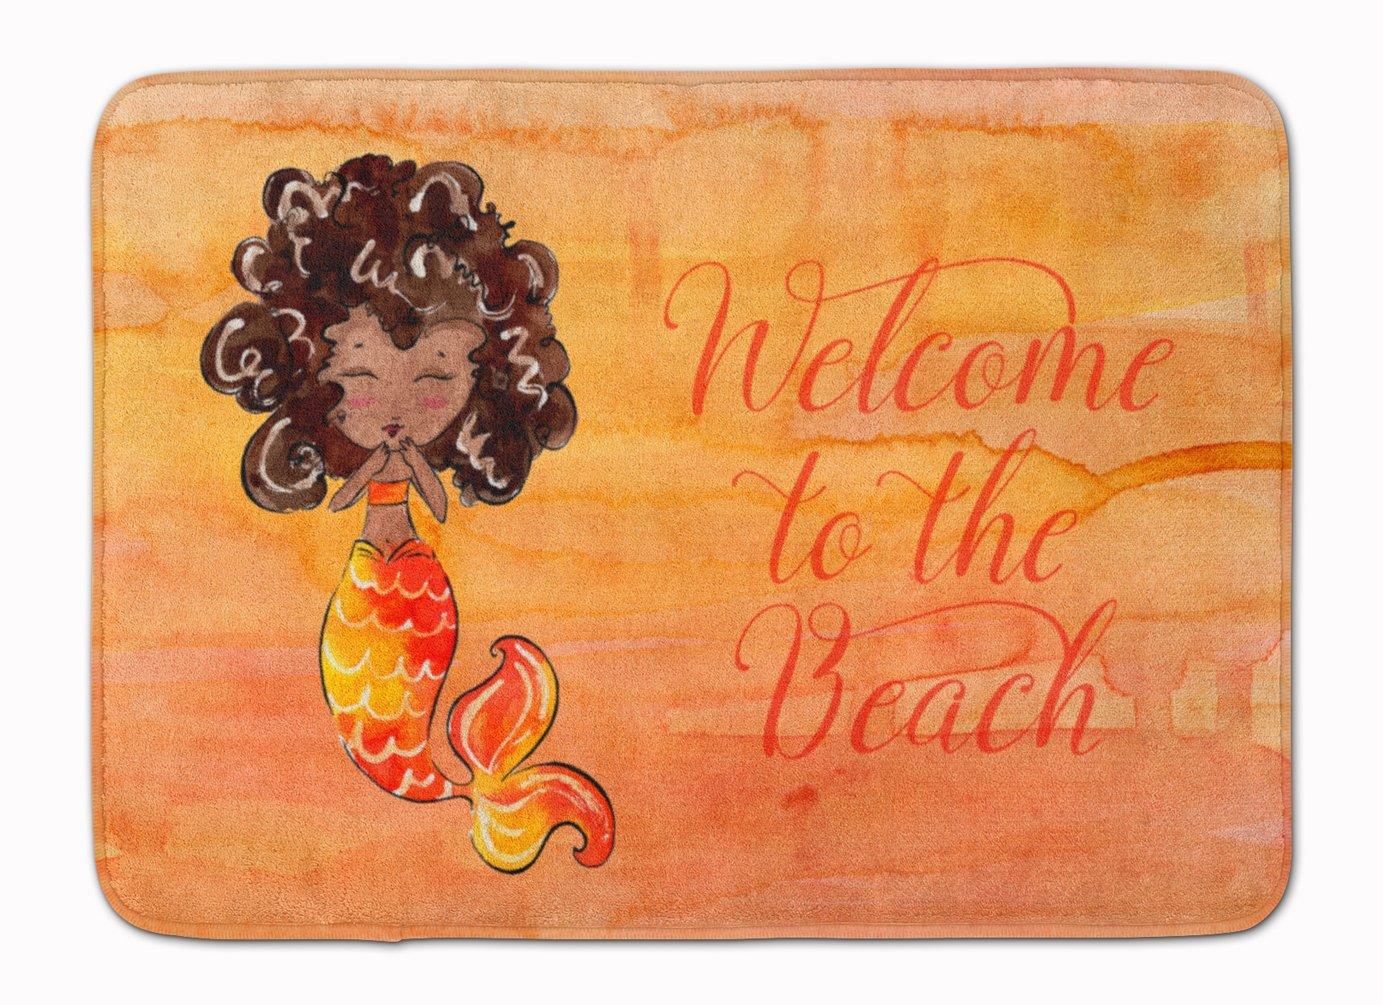 Carolines Treasures Mermaid Welcome Orange Floor Mat 19 x 27 Multicolor